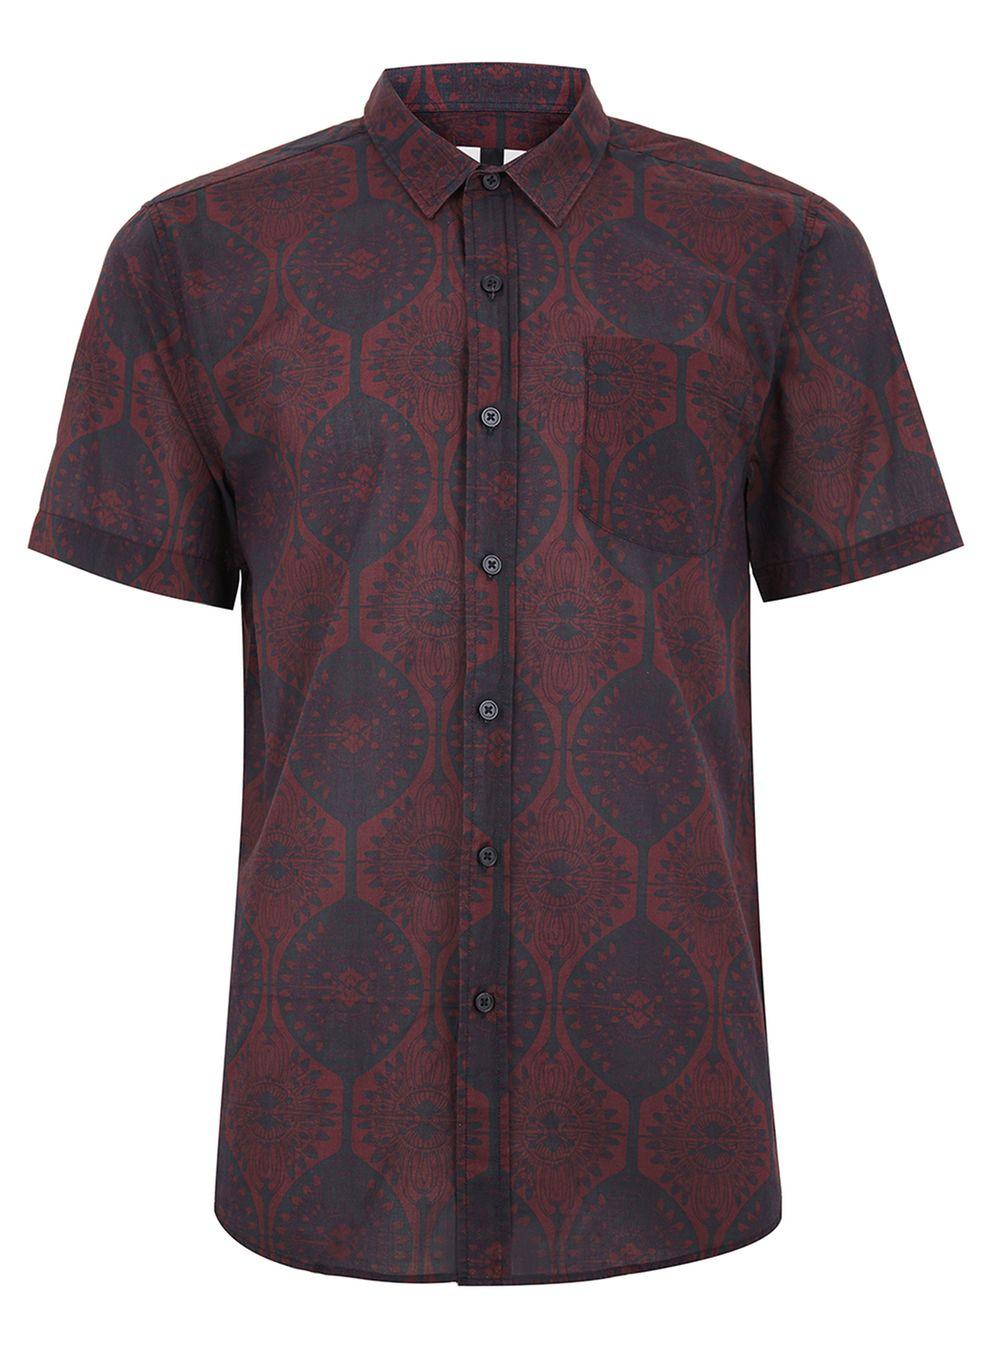 TopMan Burgandy Art Deco Shirt.jpg